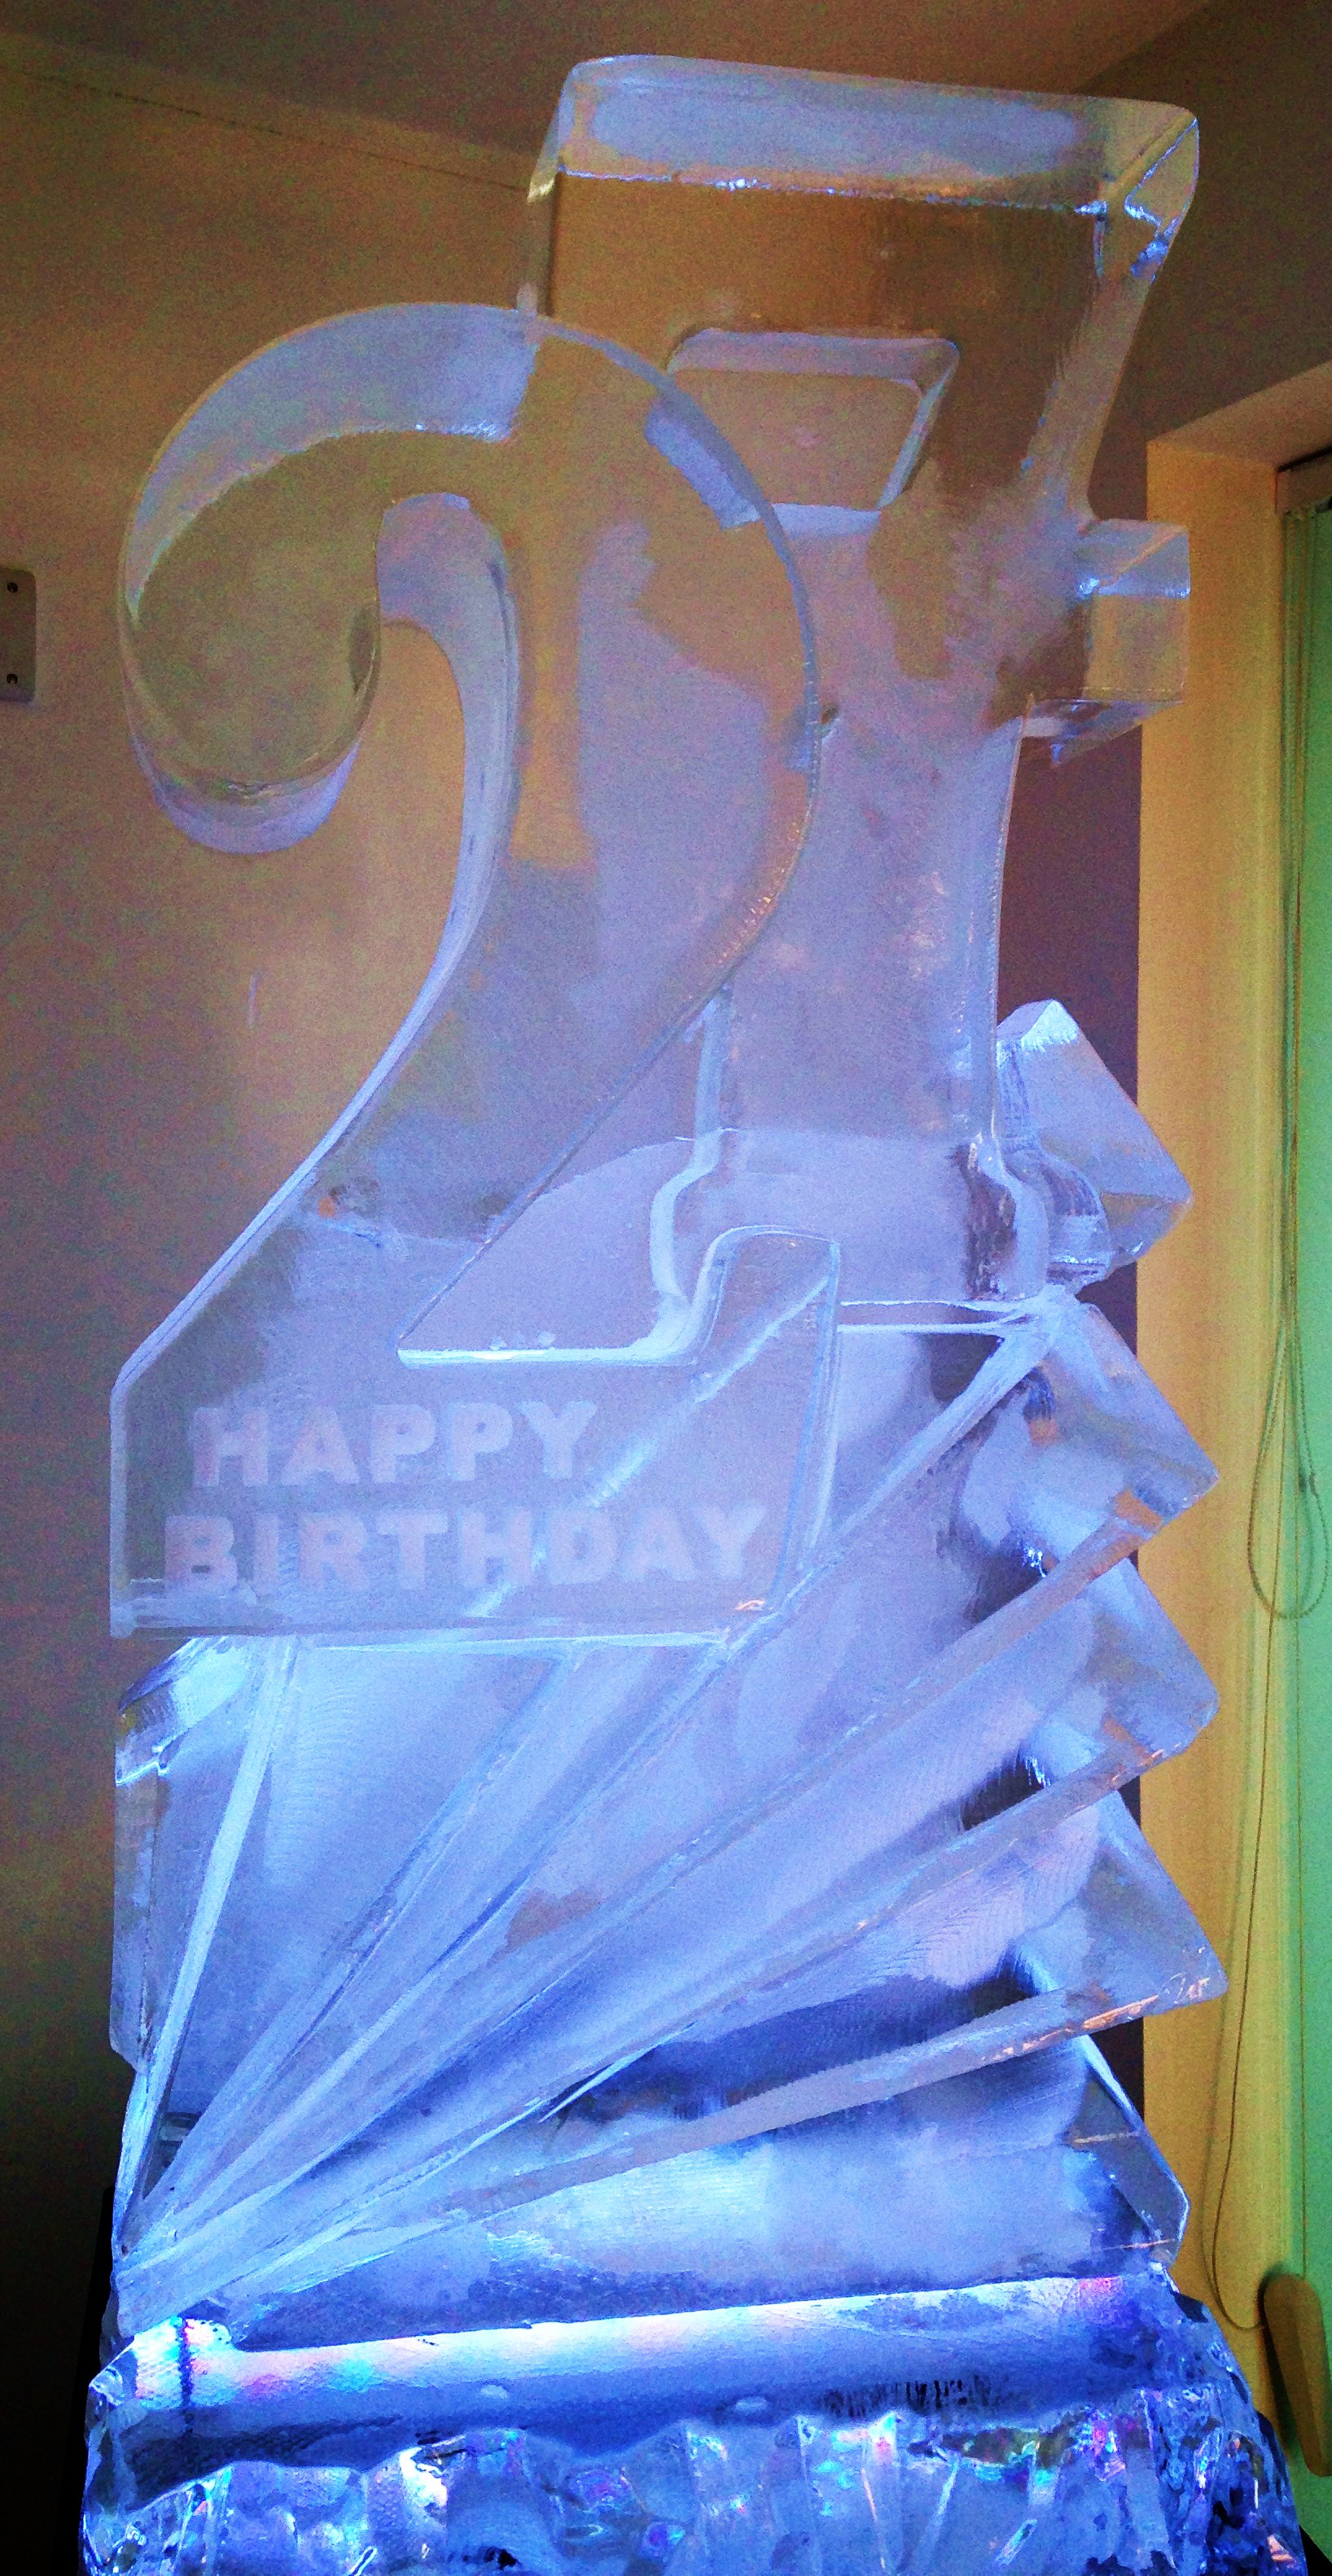 Birthday Numbers Ice Sculpture